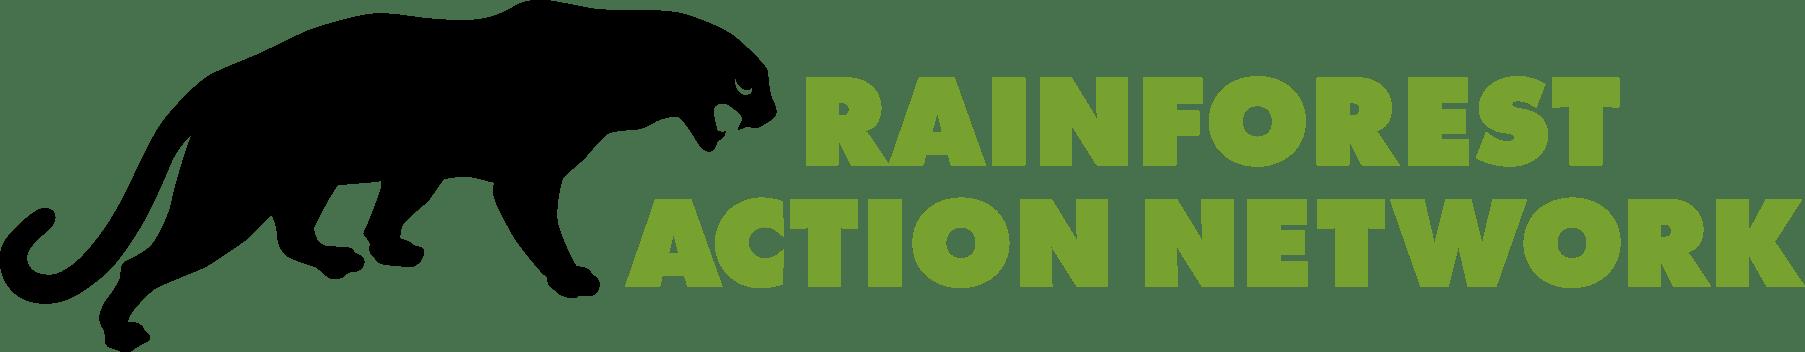 Rainforest Action Network logo